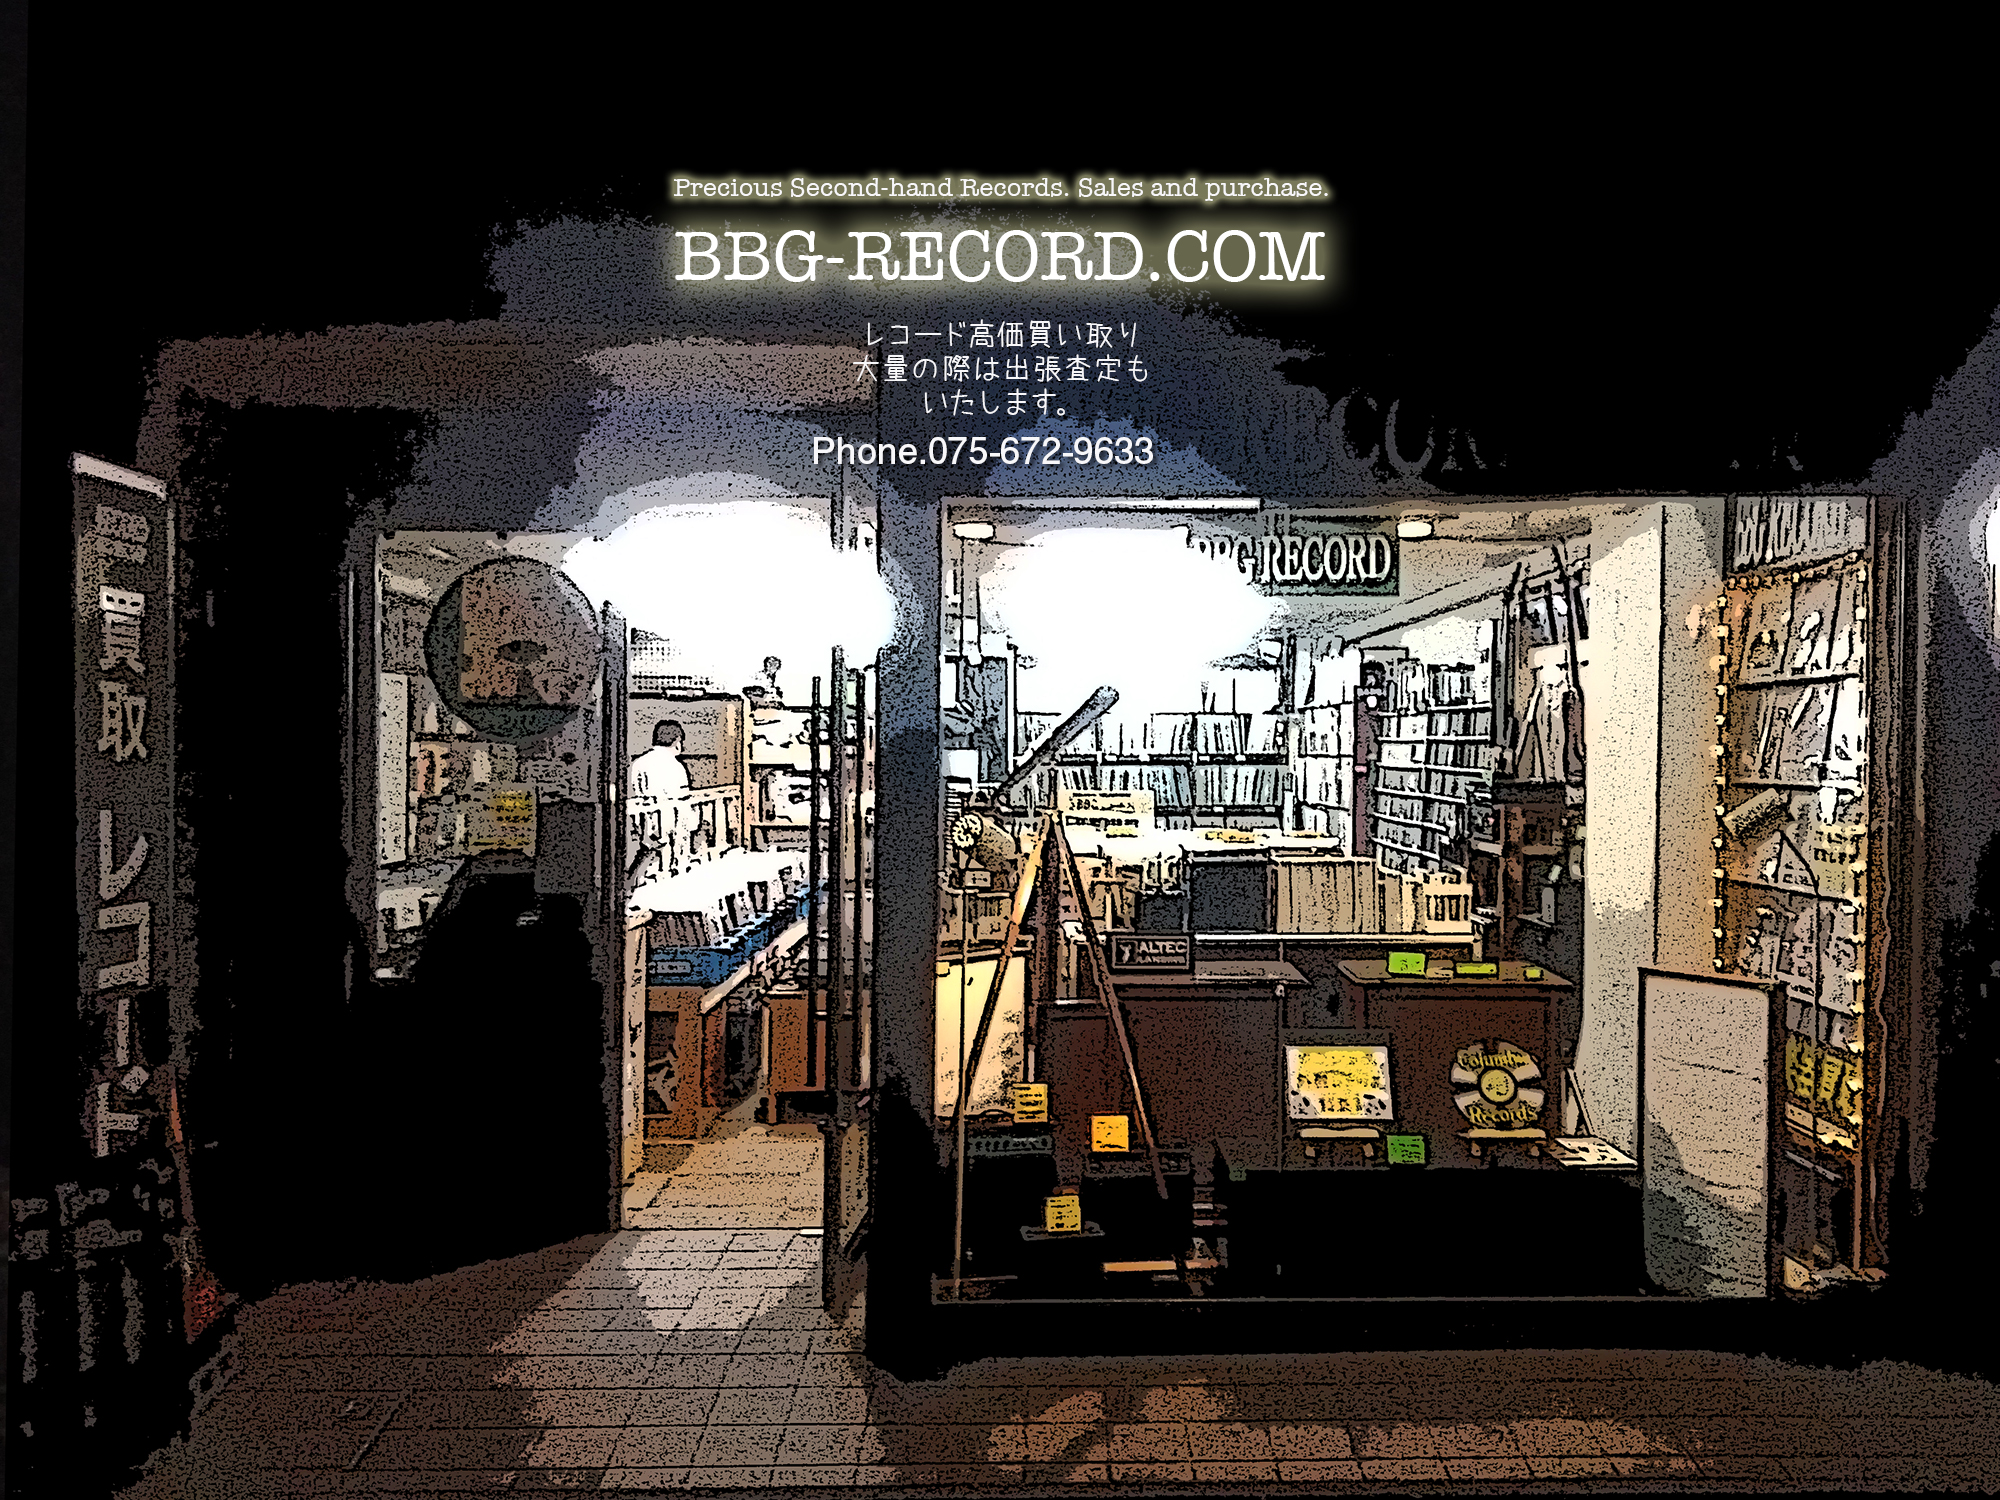 BBG-Record